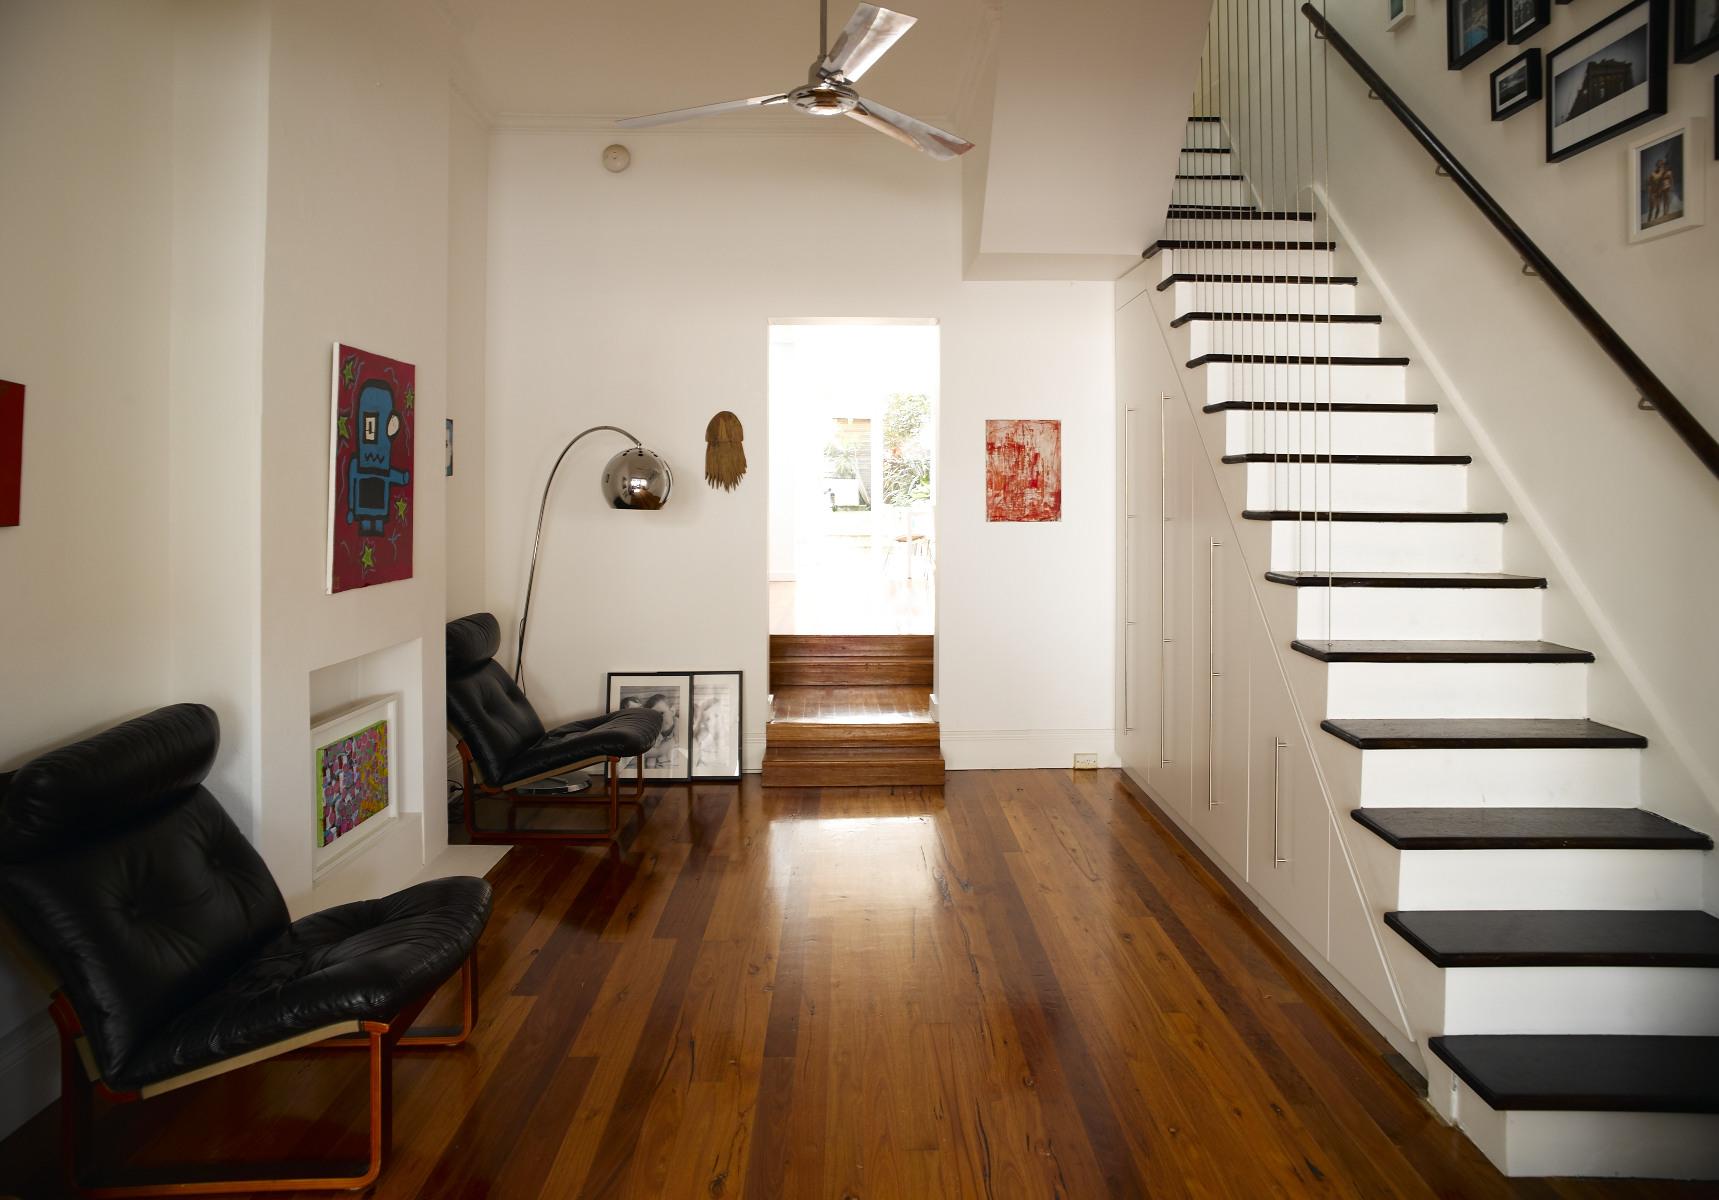 interiors 0150.jpg